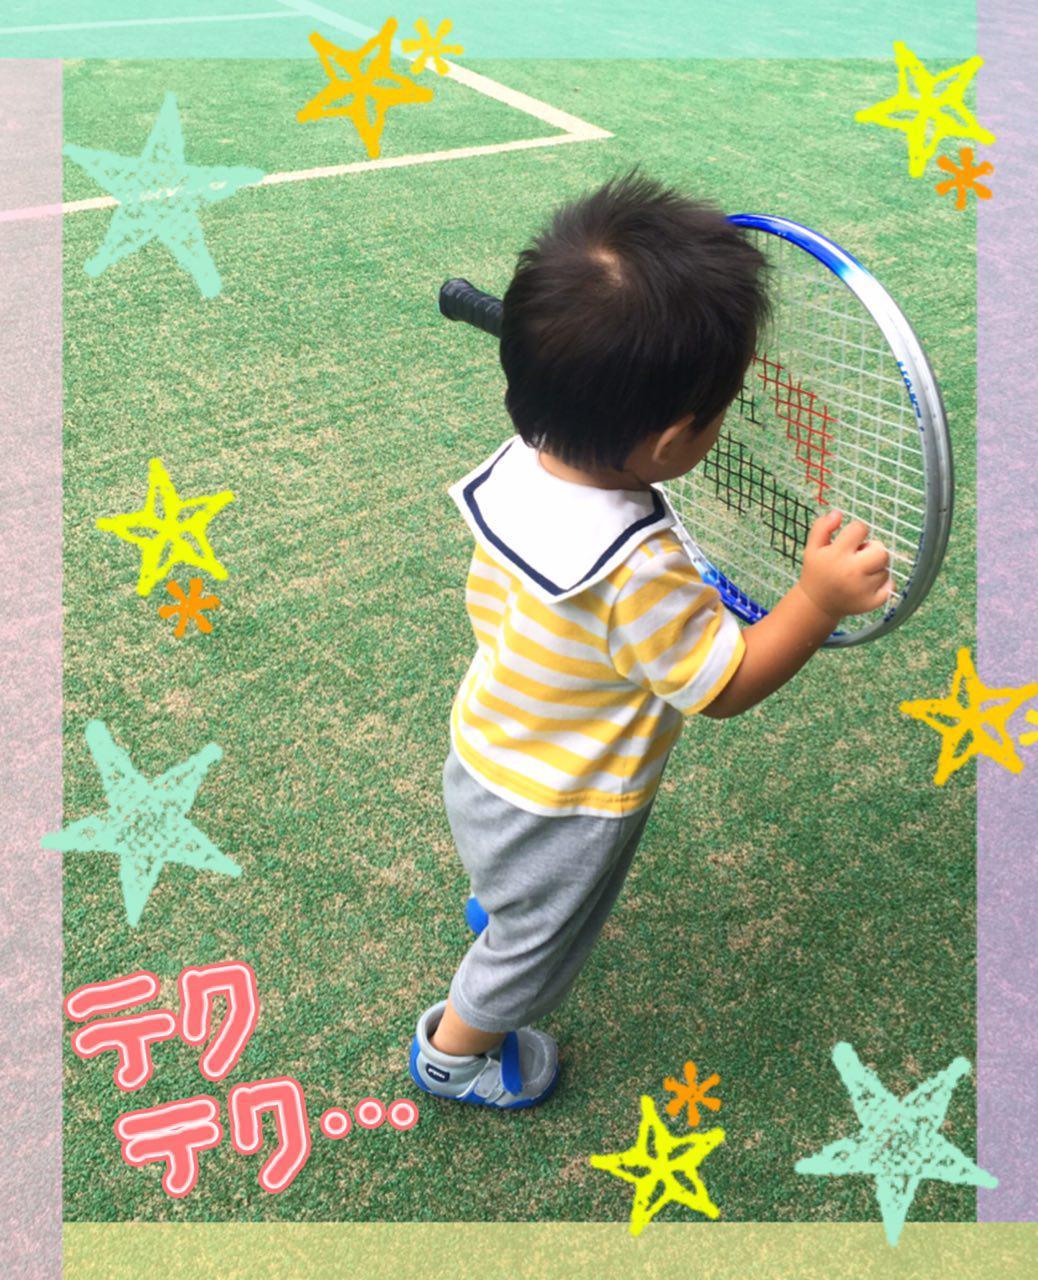 photo_2017-08-13_22-46-29.jpg